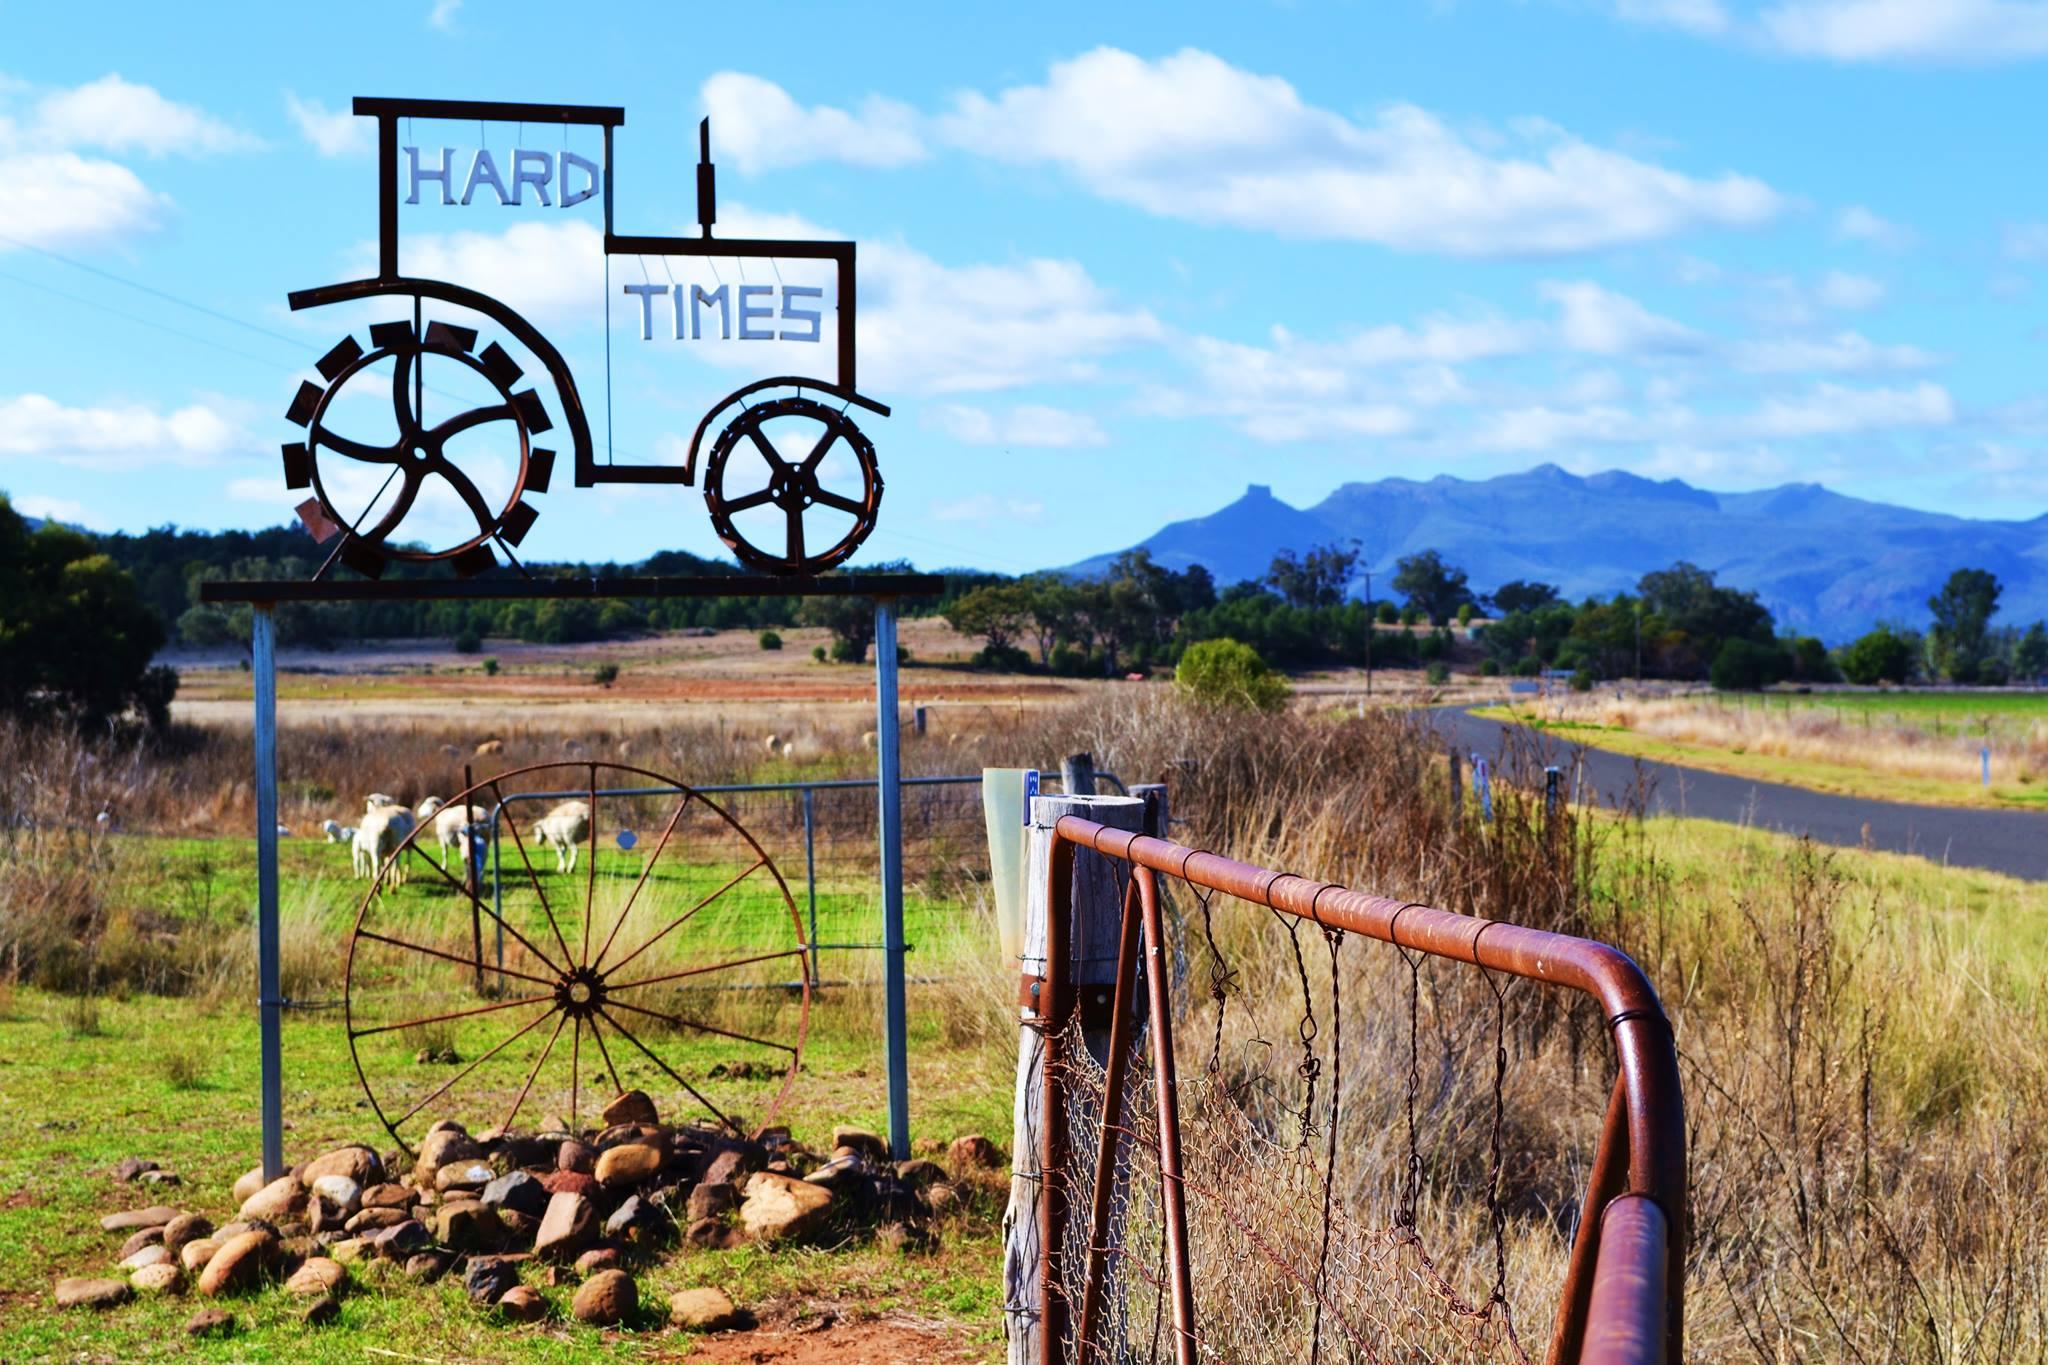 Hard Times, by Liza, from Narrabri Shire